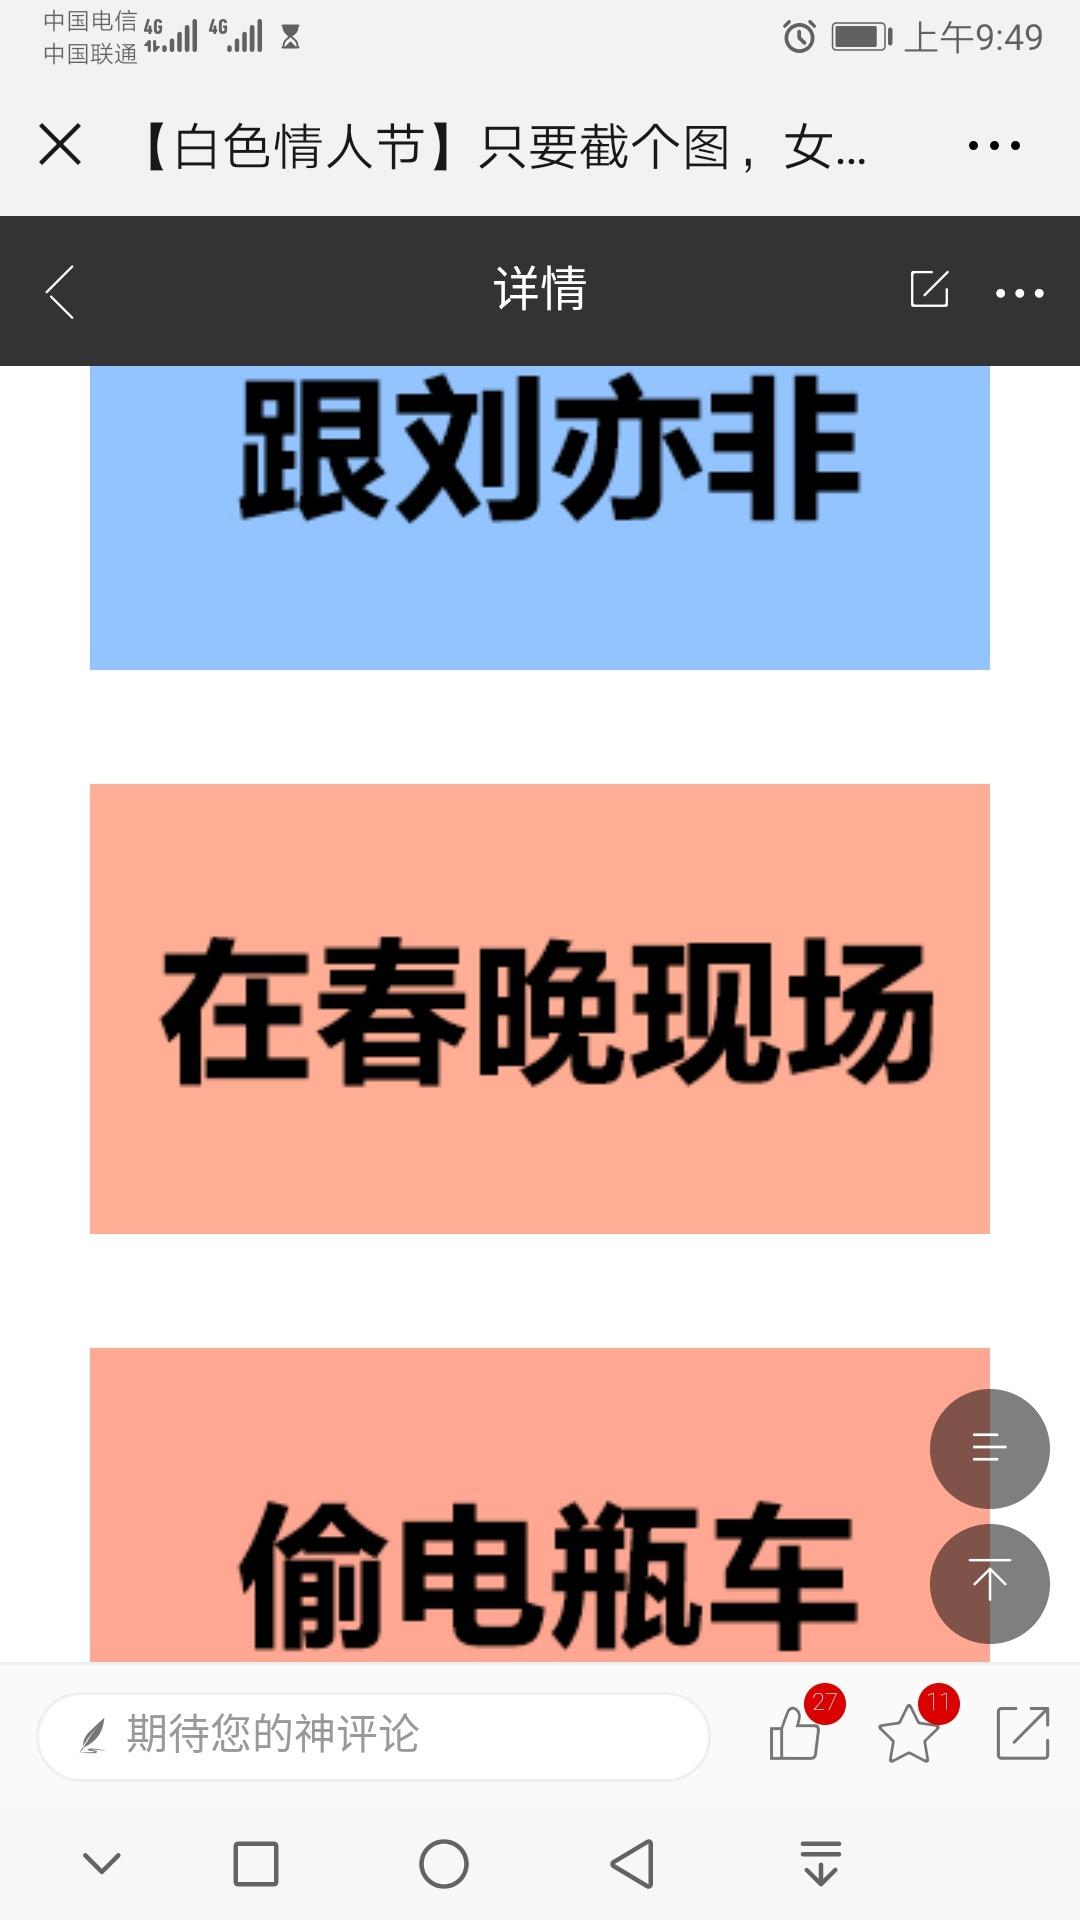 Screenshot_20190314_094911_com.tencent.mm.jpg